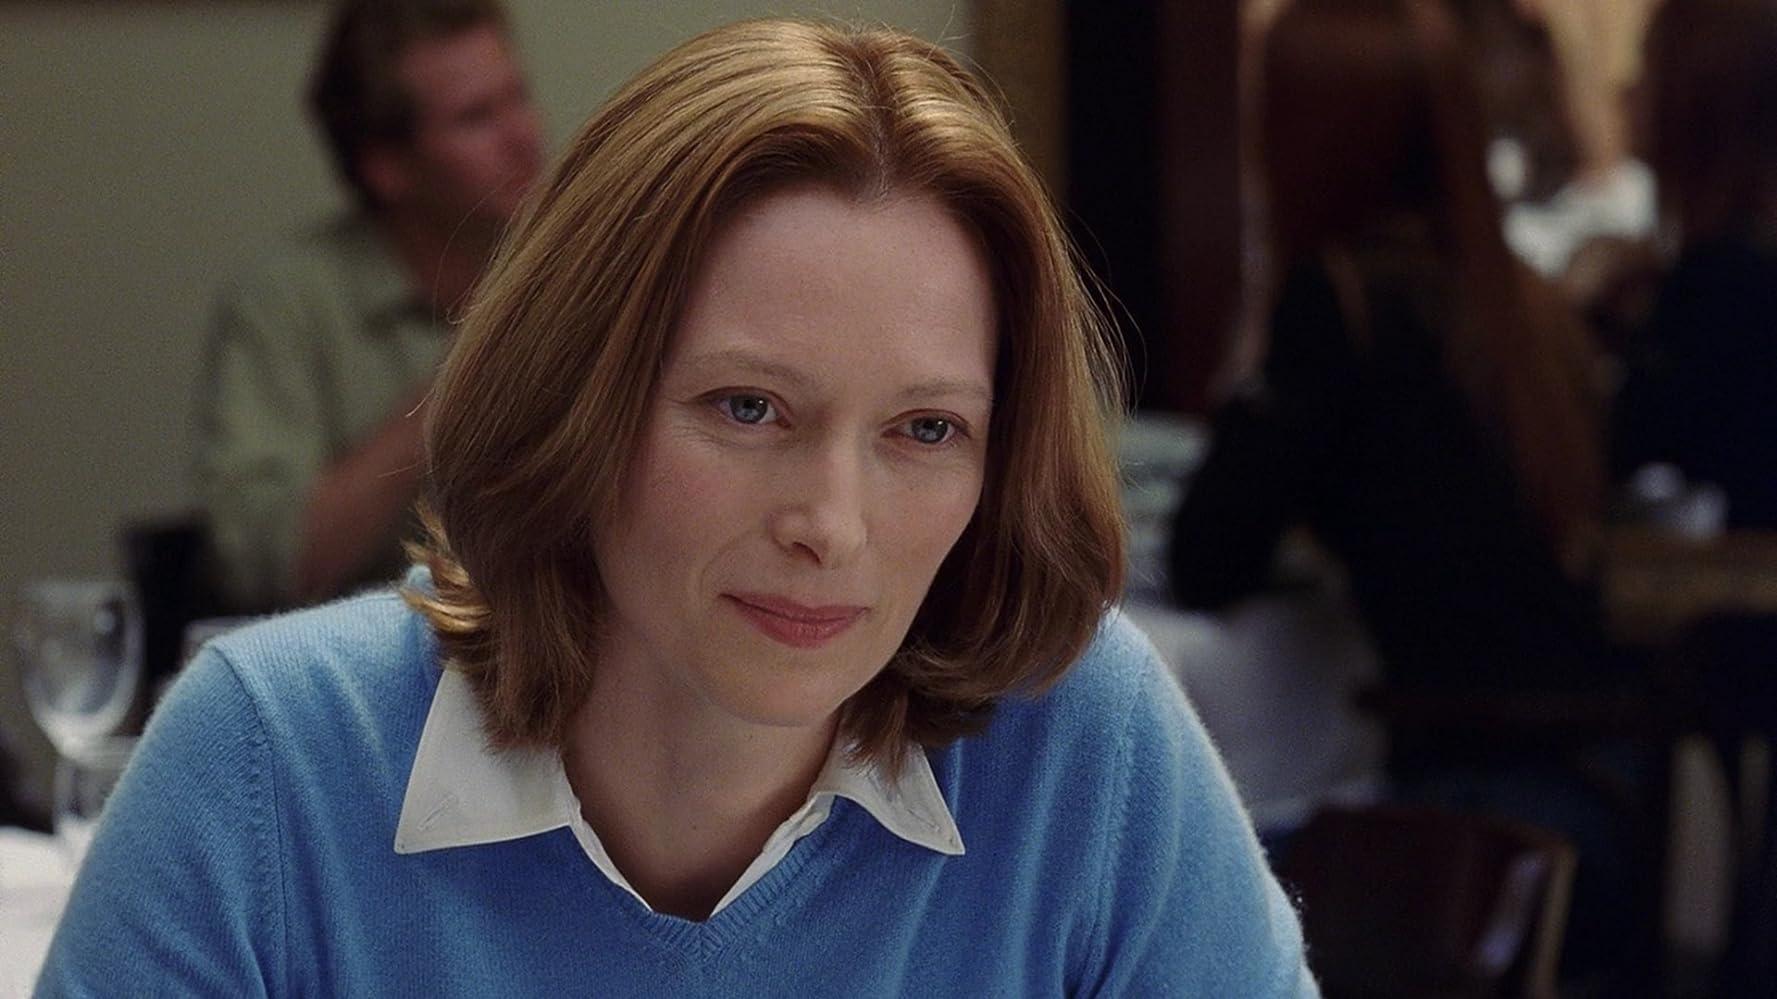 Tilda Swinton in Adaptation. (2002)